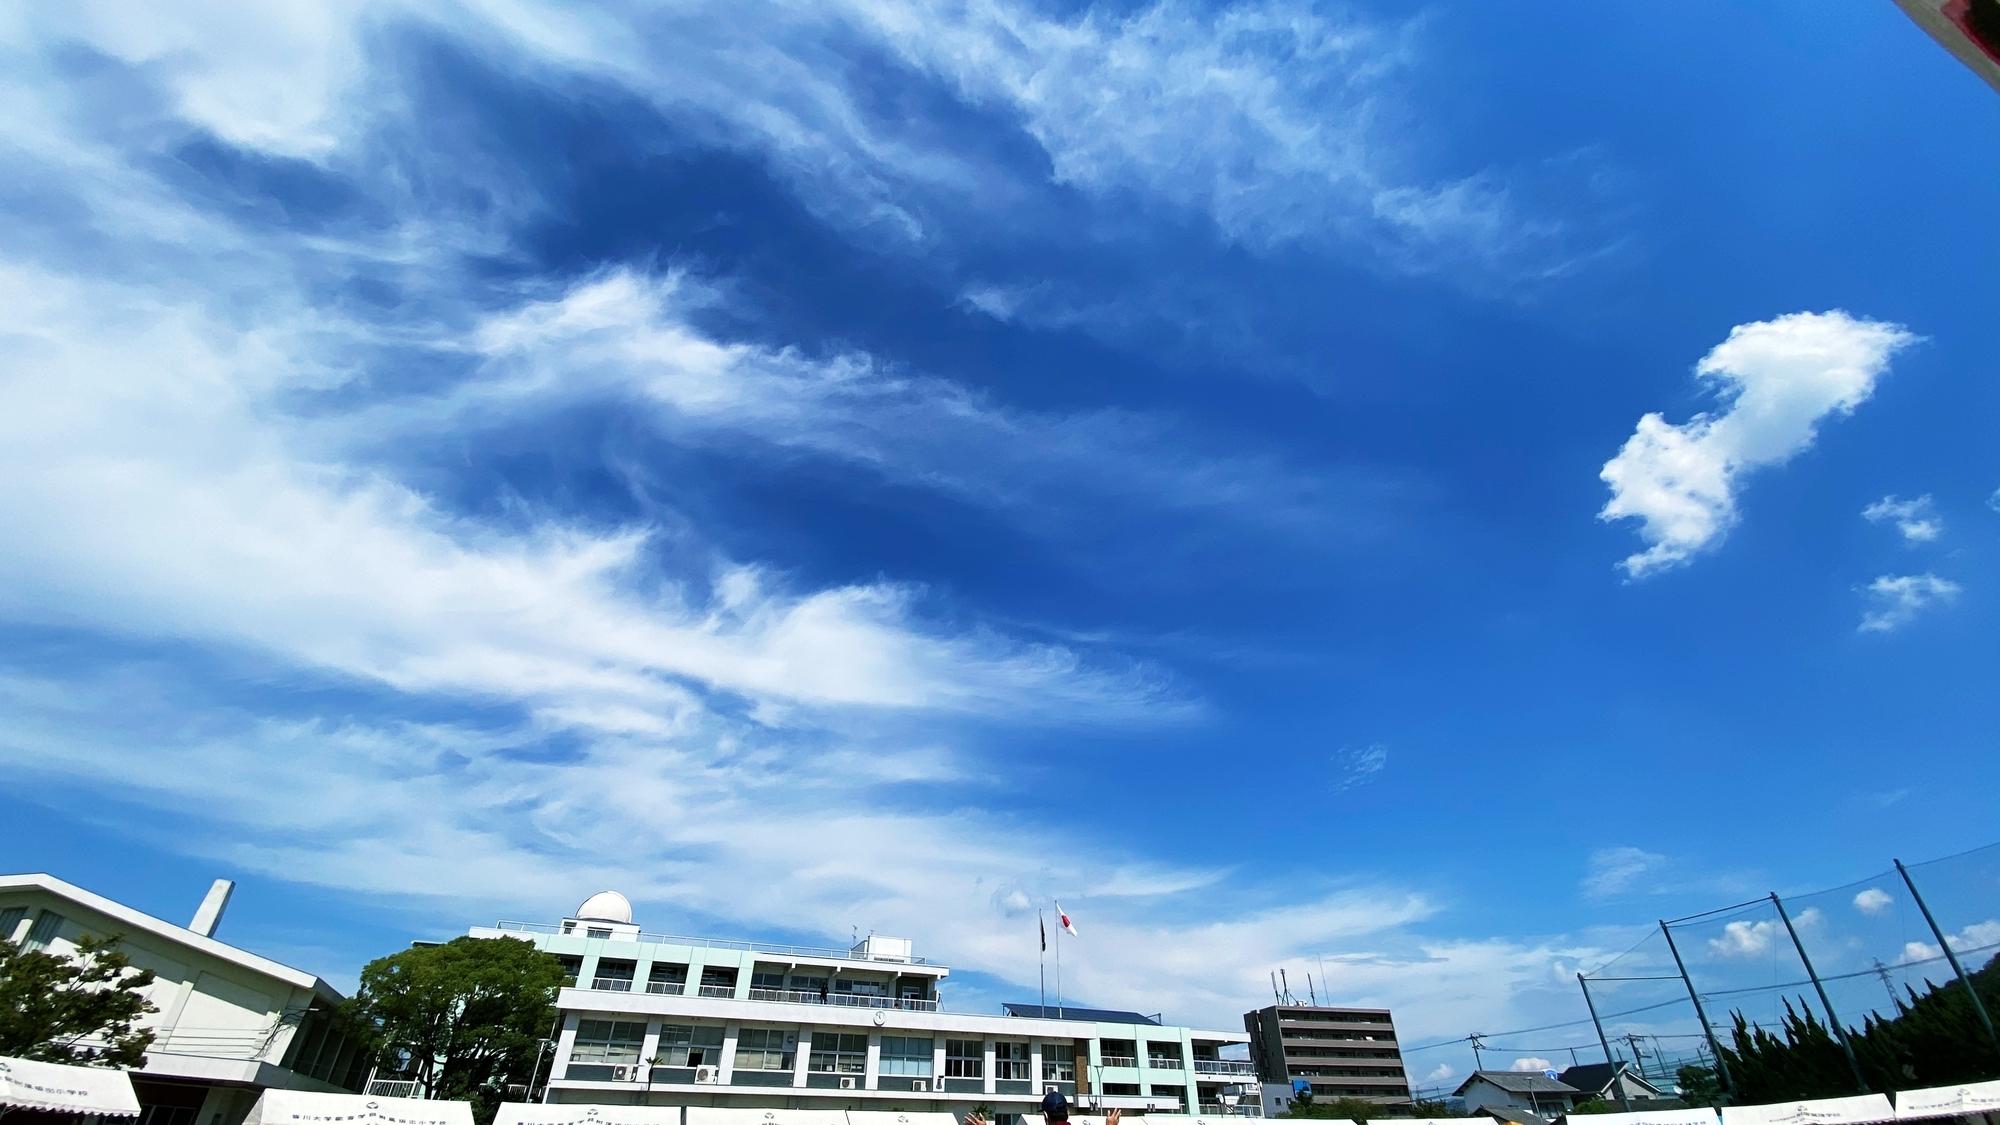 f:id:Logosuke:20200920193047j:plain